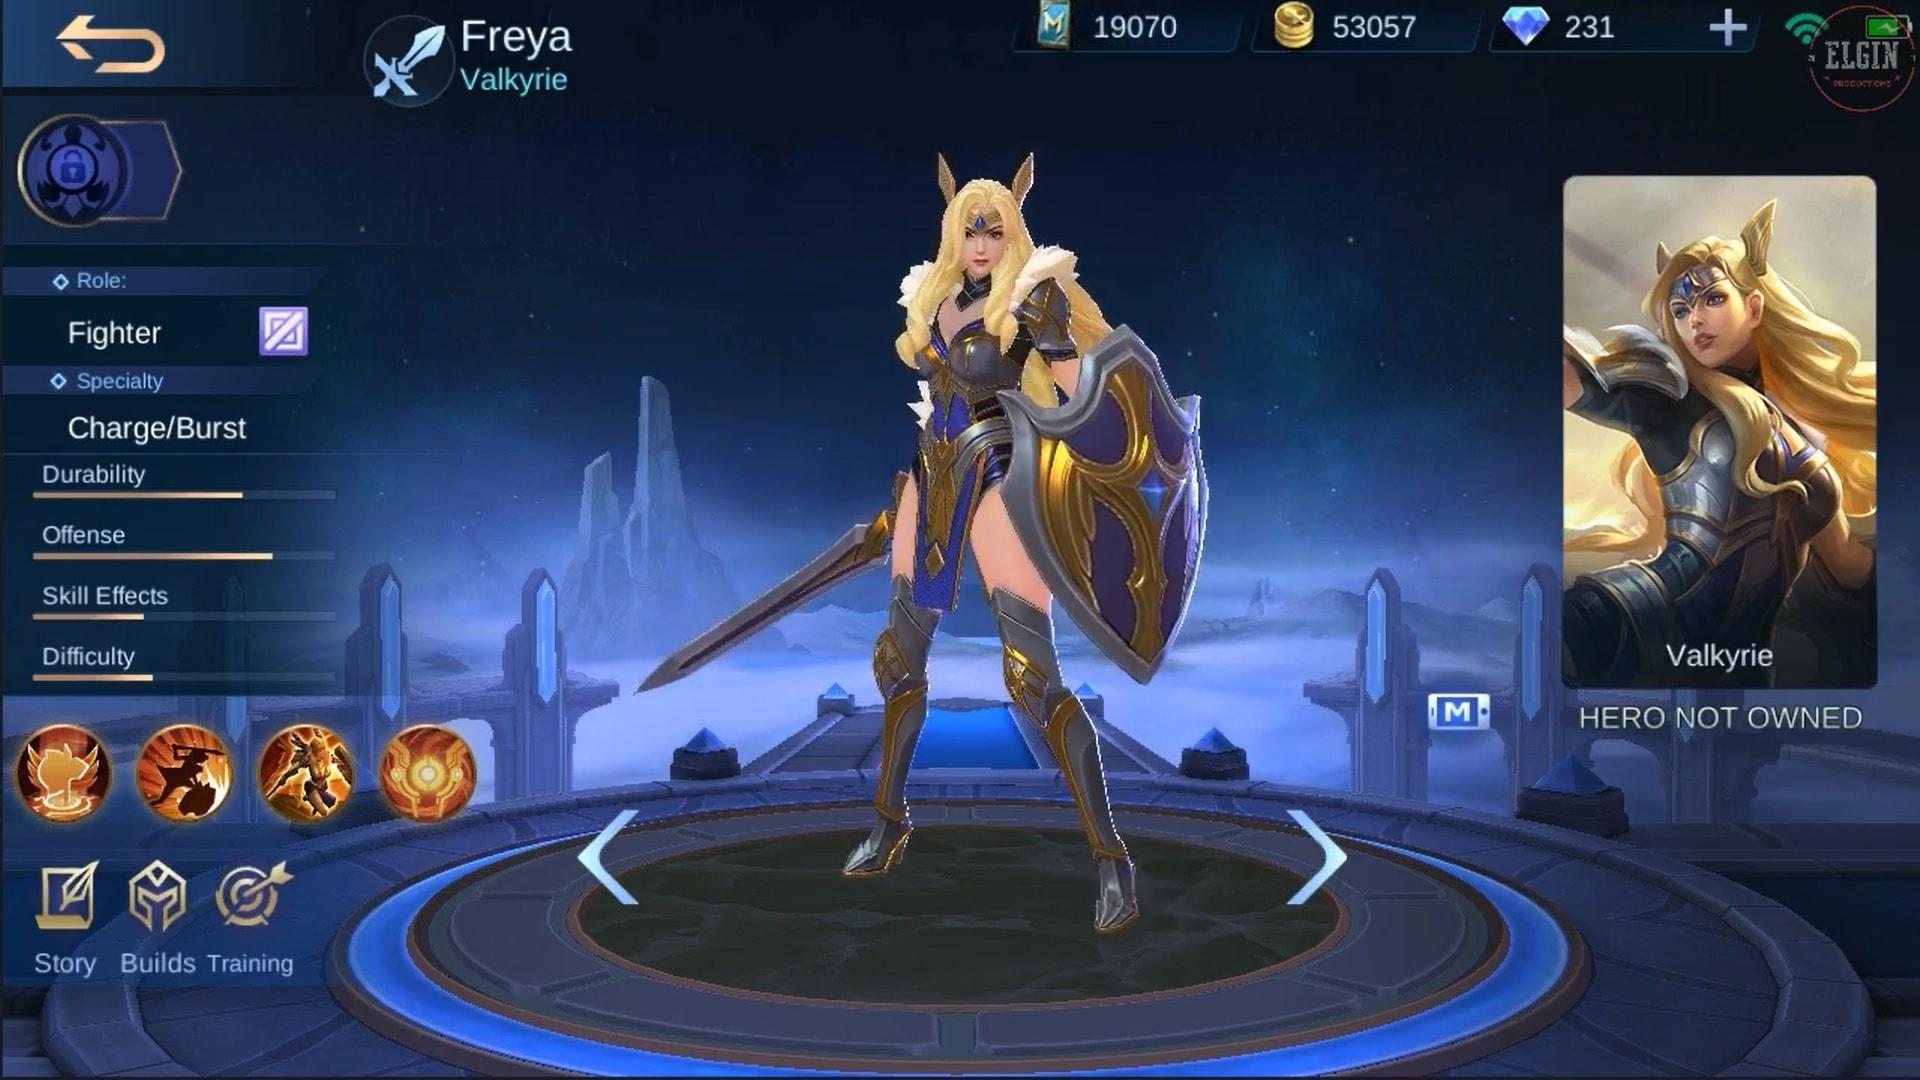 Hero Freya ML Revamp Jadi OP Mobile Legends 2020